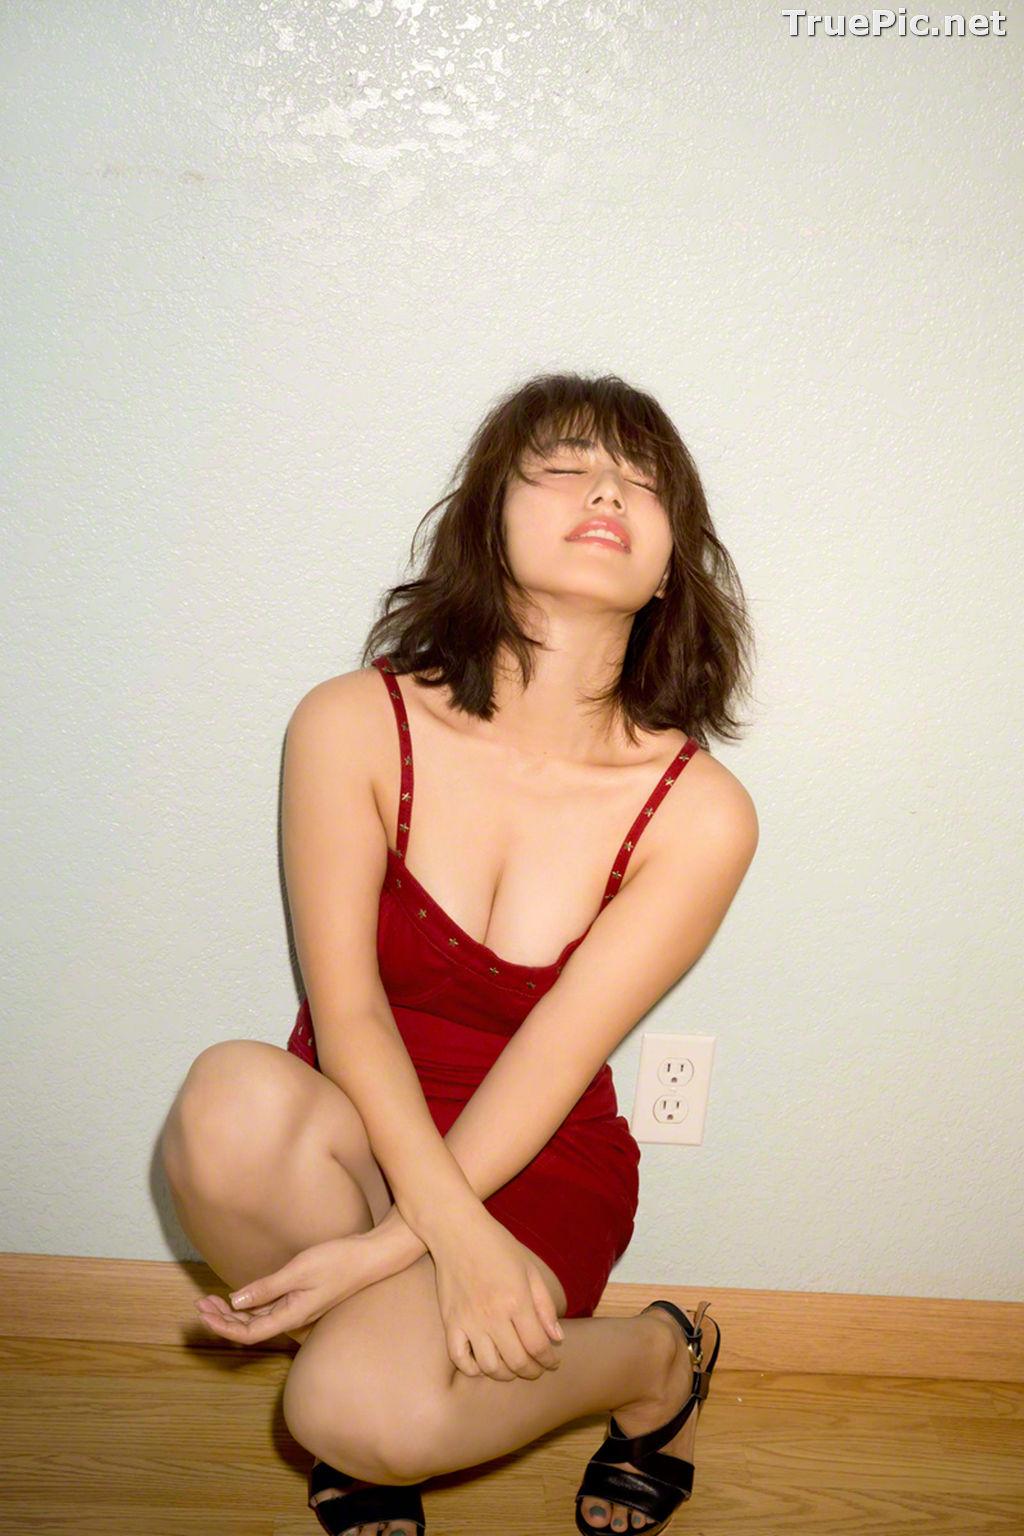 Image Wanibooks No.141 – Japanese Actress and Gravure Idol – Sayaka Isoyama - TruePic.net - Picture-7